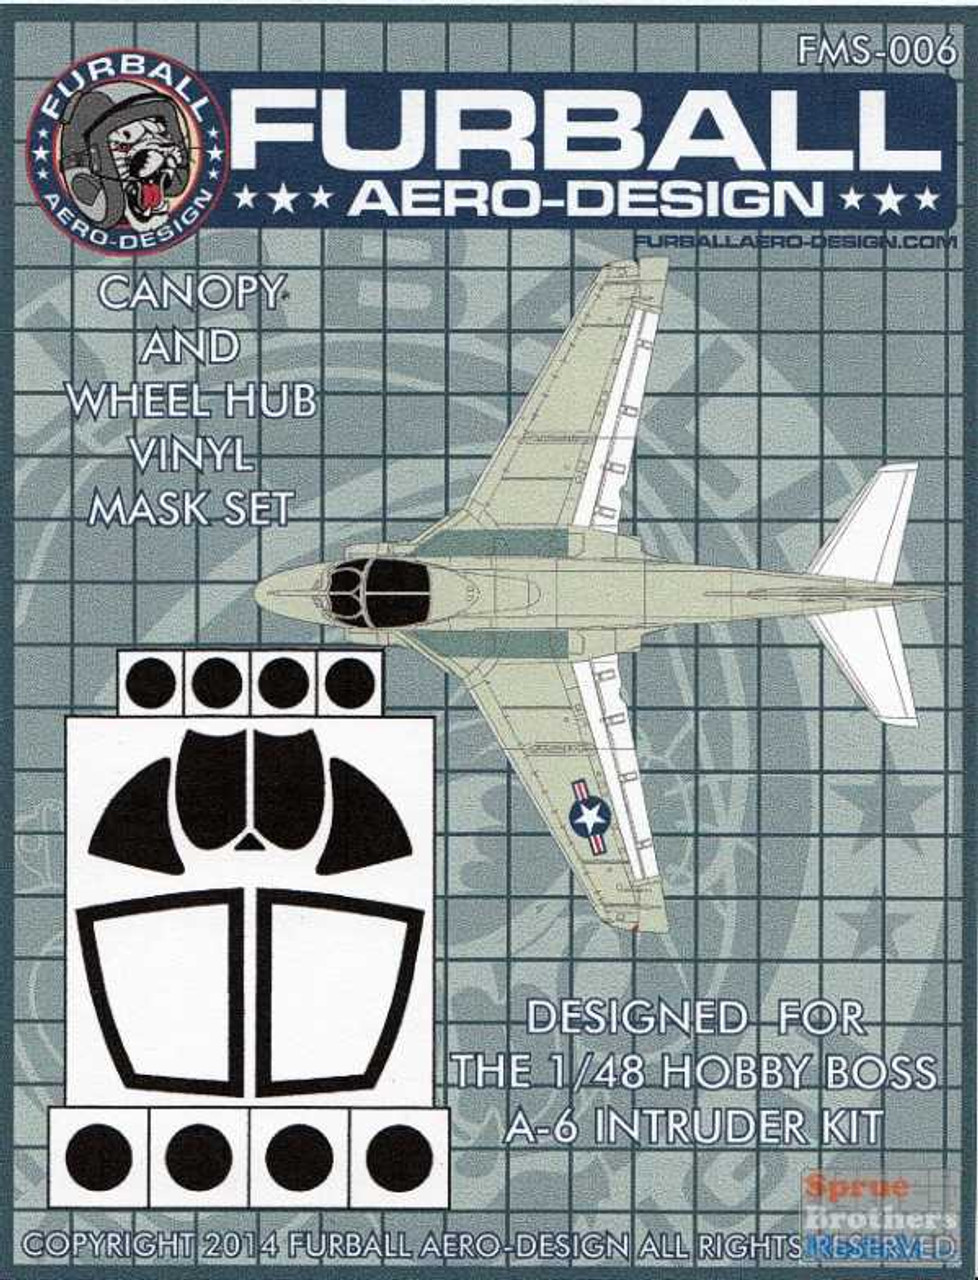 FURFMS006 1:48 Furball Aero Design Canopy & Wheel Hub Vinyl Mask Set for A-6 Intruder (HBS kit)